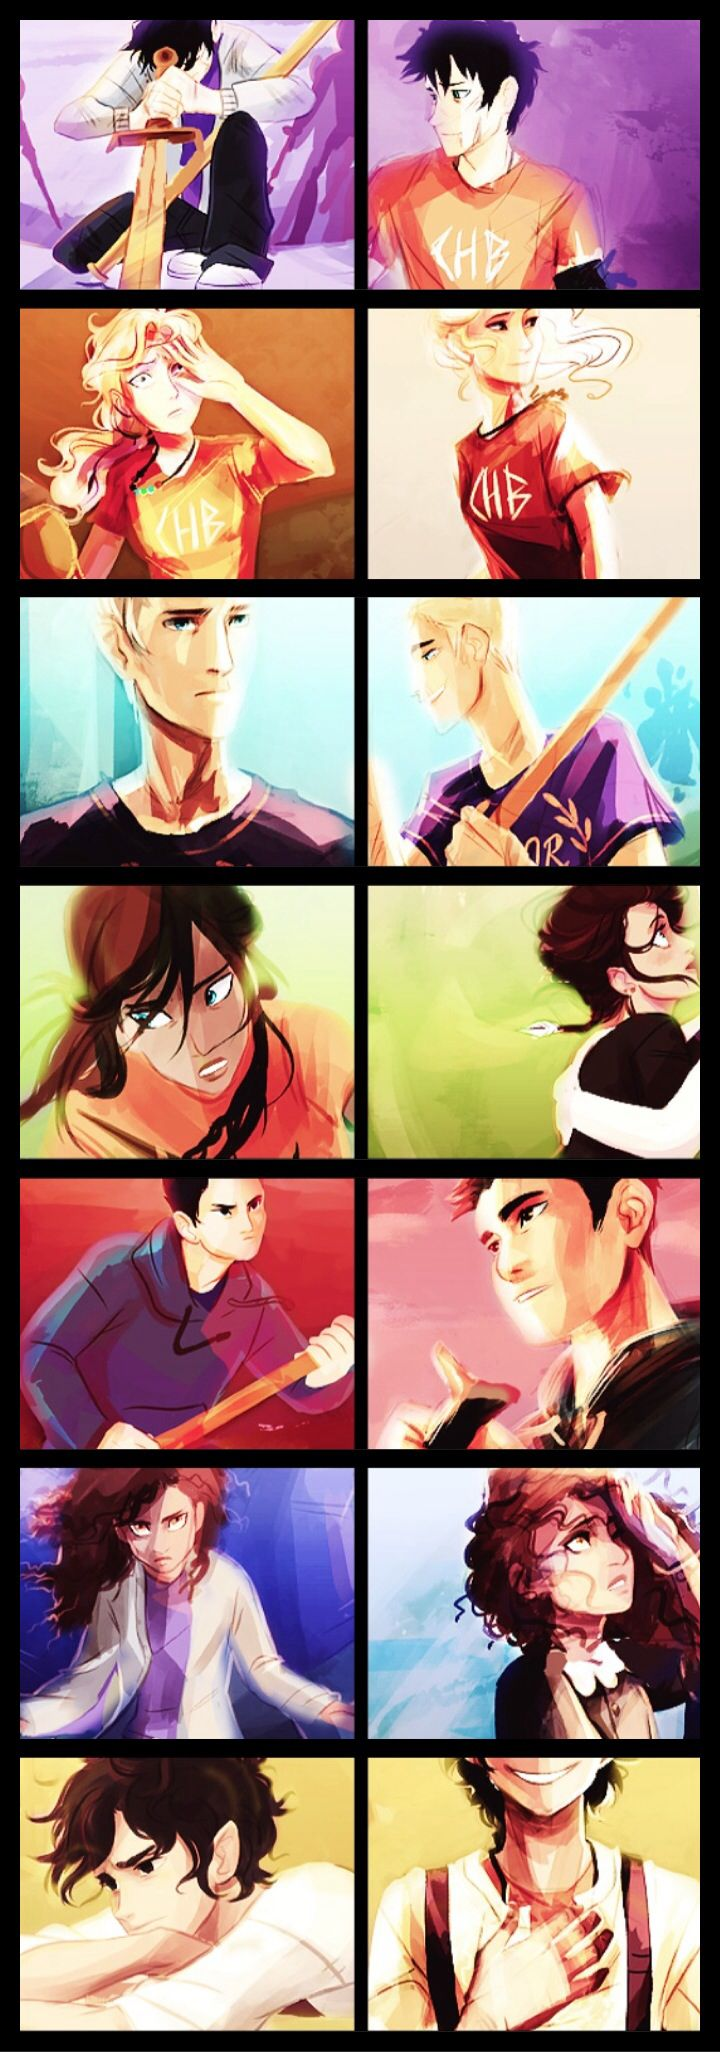 From top to bottom : Percy, Annabeth, Jason, Piper, Frank, Hazel and Leo